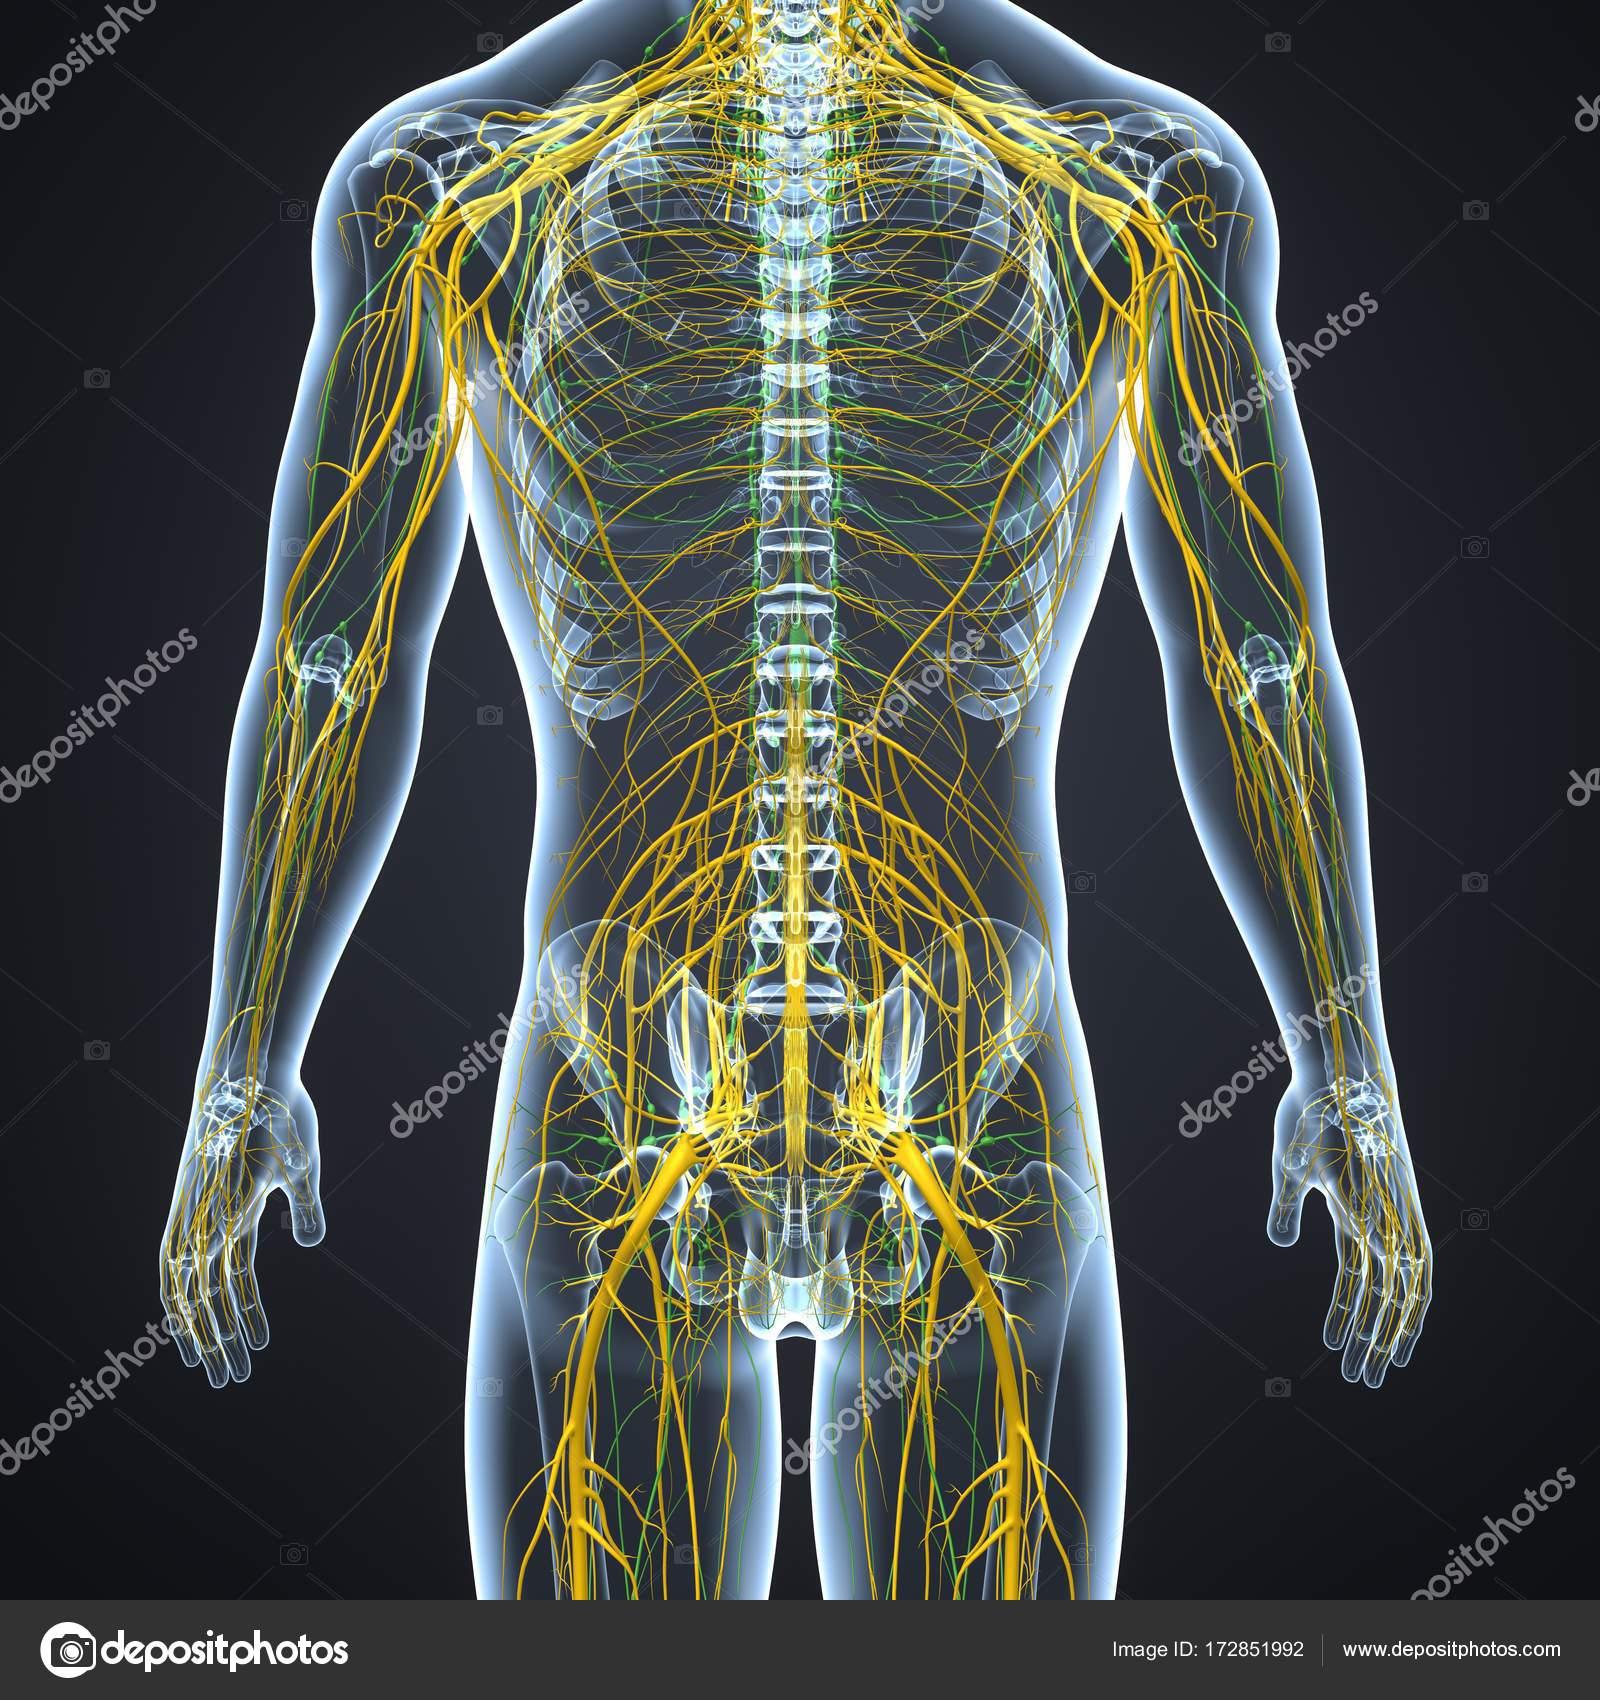 Nervensystem mit Lymphknoten — Stockfoto © sciencepics #172851992